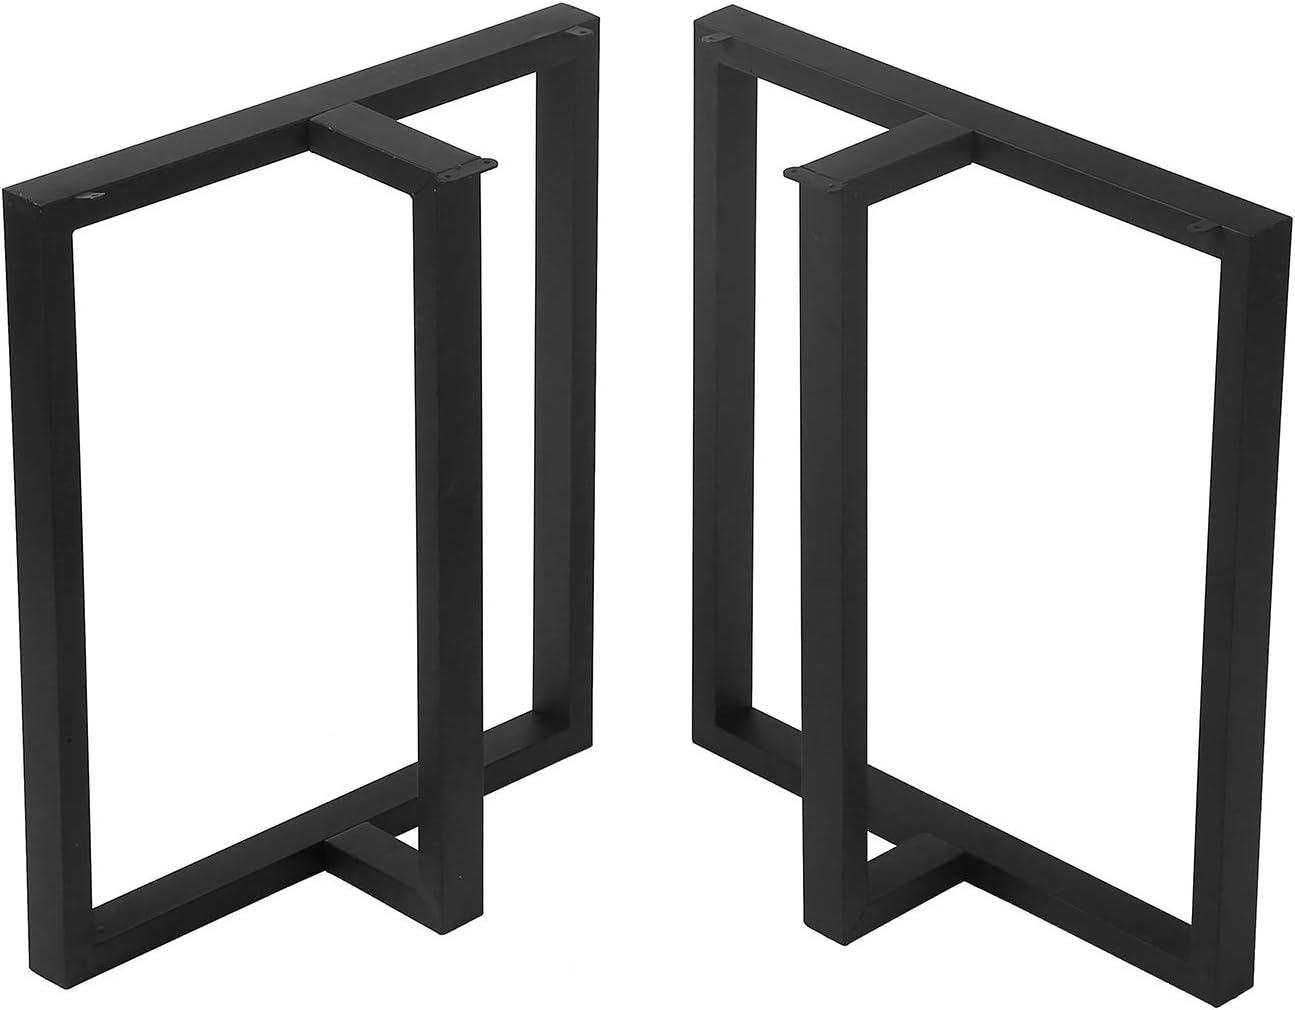 "TOKIKA Industrial Rustic Furniture Legs 28"" H x 24"" W Decory T-Shaped Table Legs,Heavy Duty Metal Desk Legs,Dining Table Legs, DIY Iron Brackets Bench Legs(Set of 2, Black)"